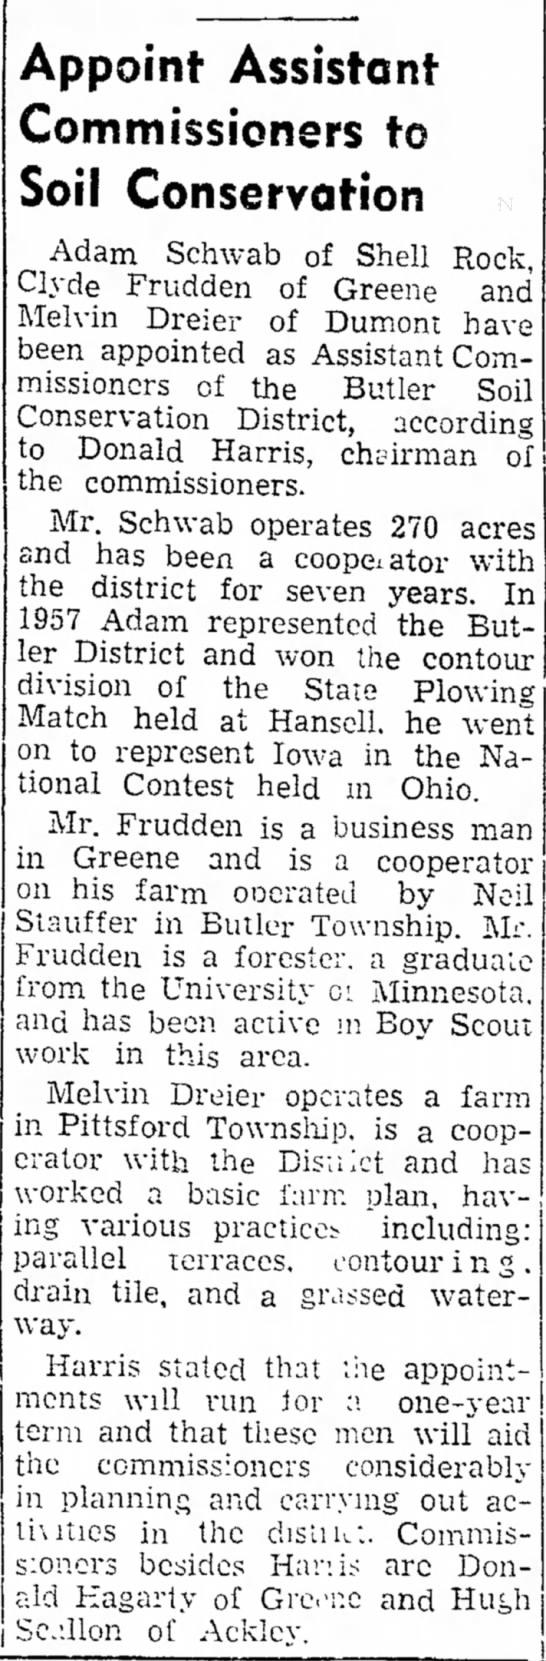 The Greene Recorder, Greene, Iowa Wednesday, March 25, 1959Hugh Scallon